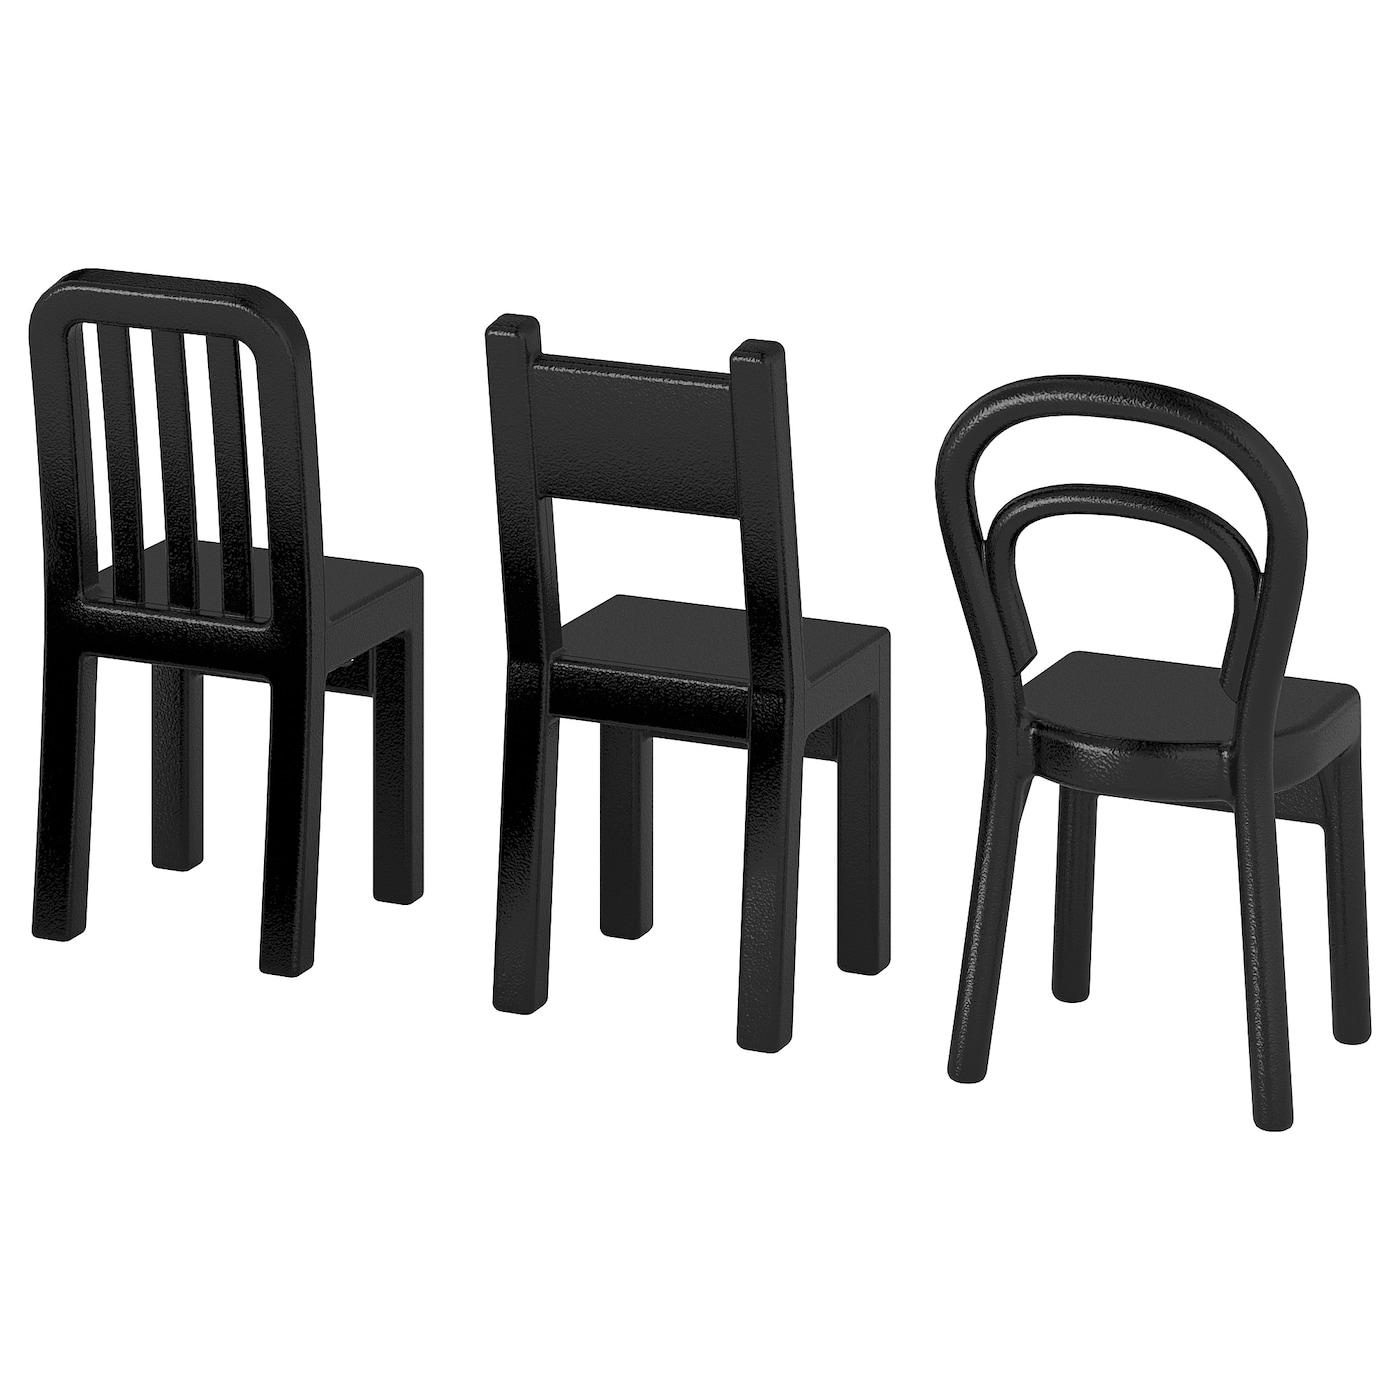 IKEA spruttig Cintre en Noir; 10 Pièces Cintre